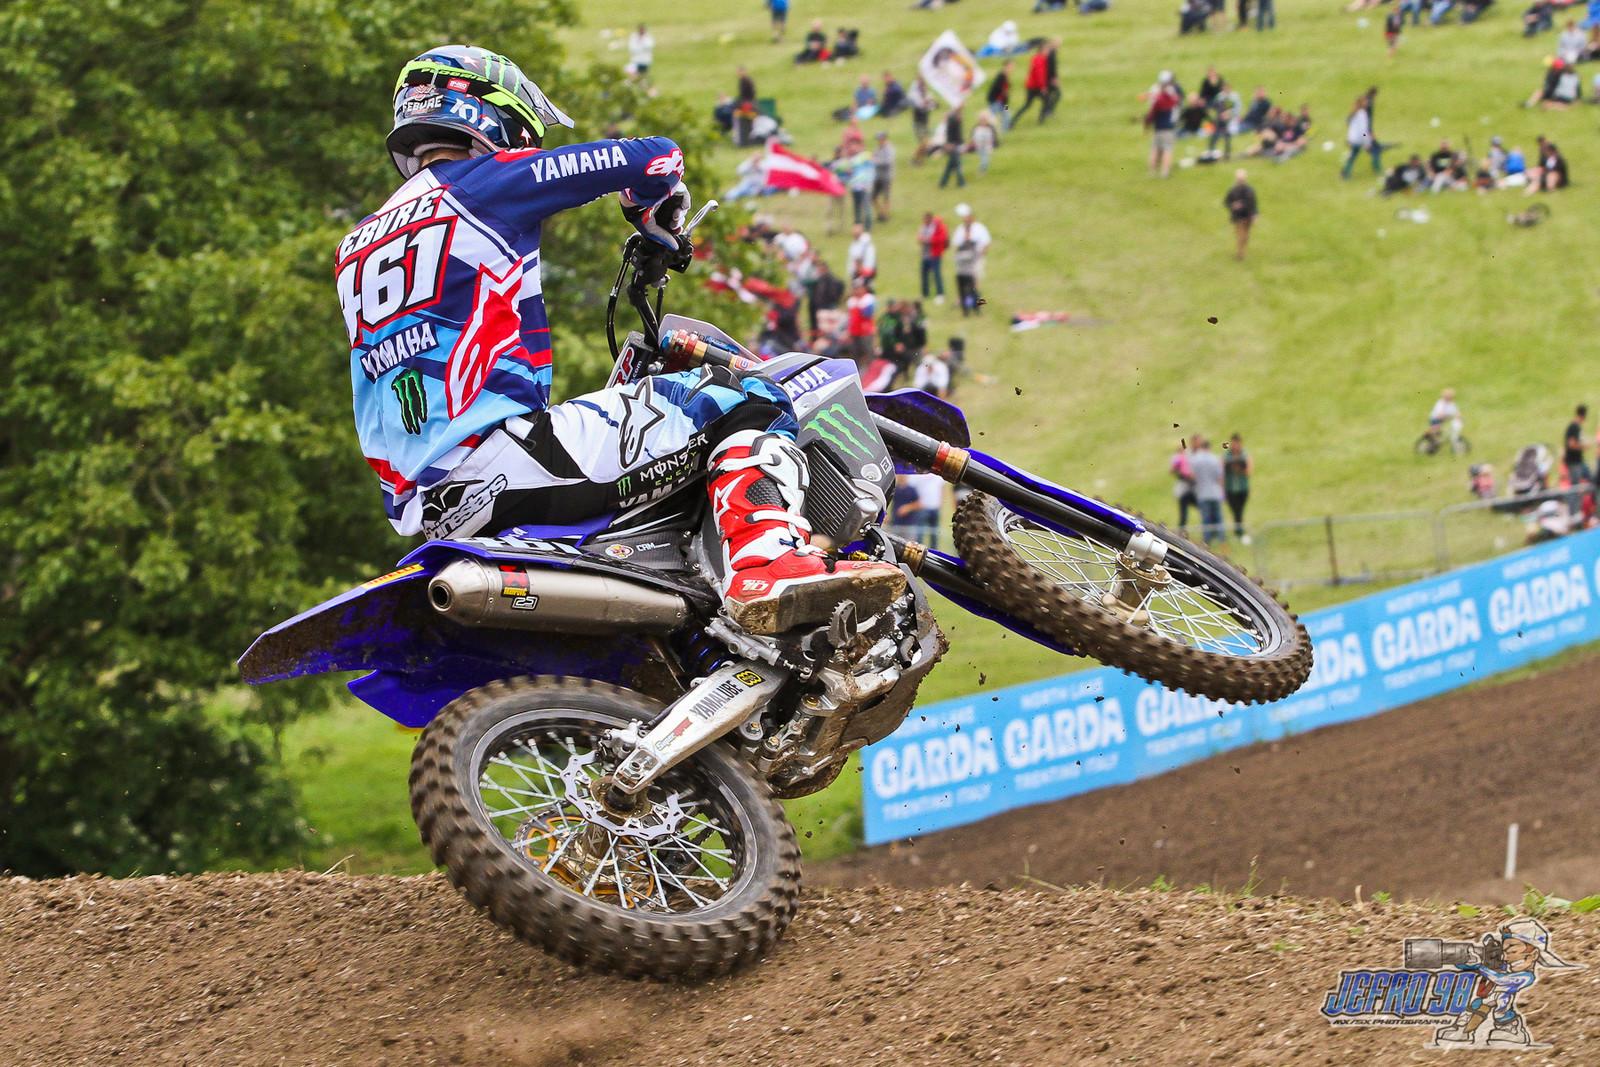 Romain Febvre - Photo Gallery: MXGP of Great Britain - Motocross Pictures - Vital MX